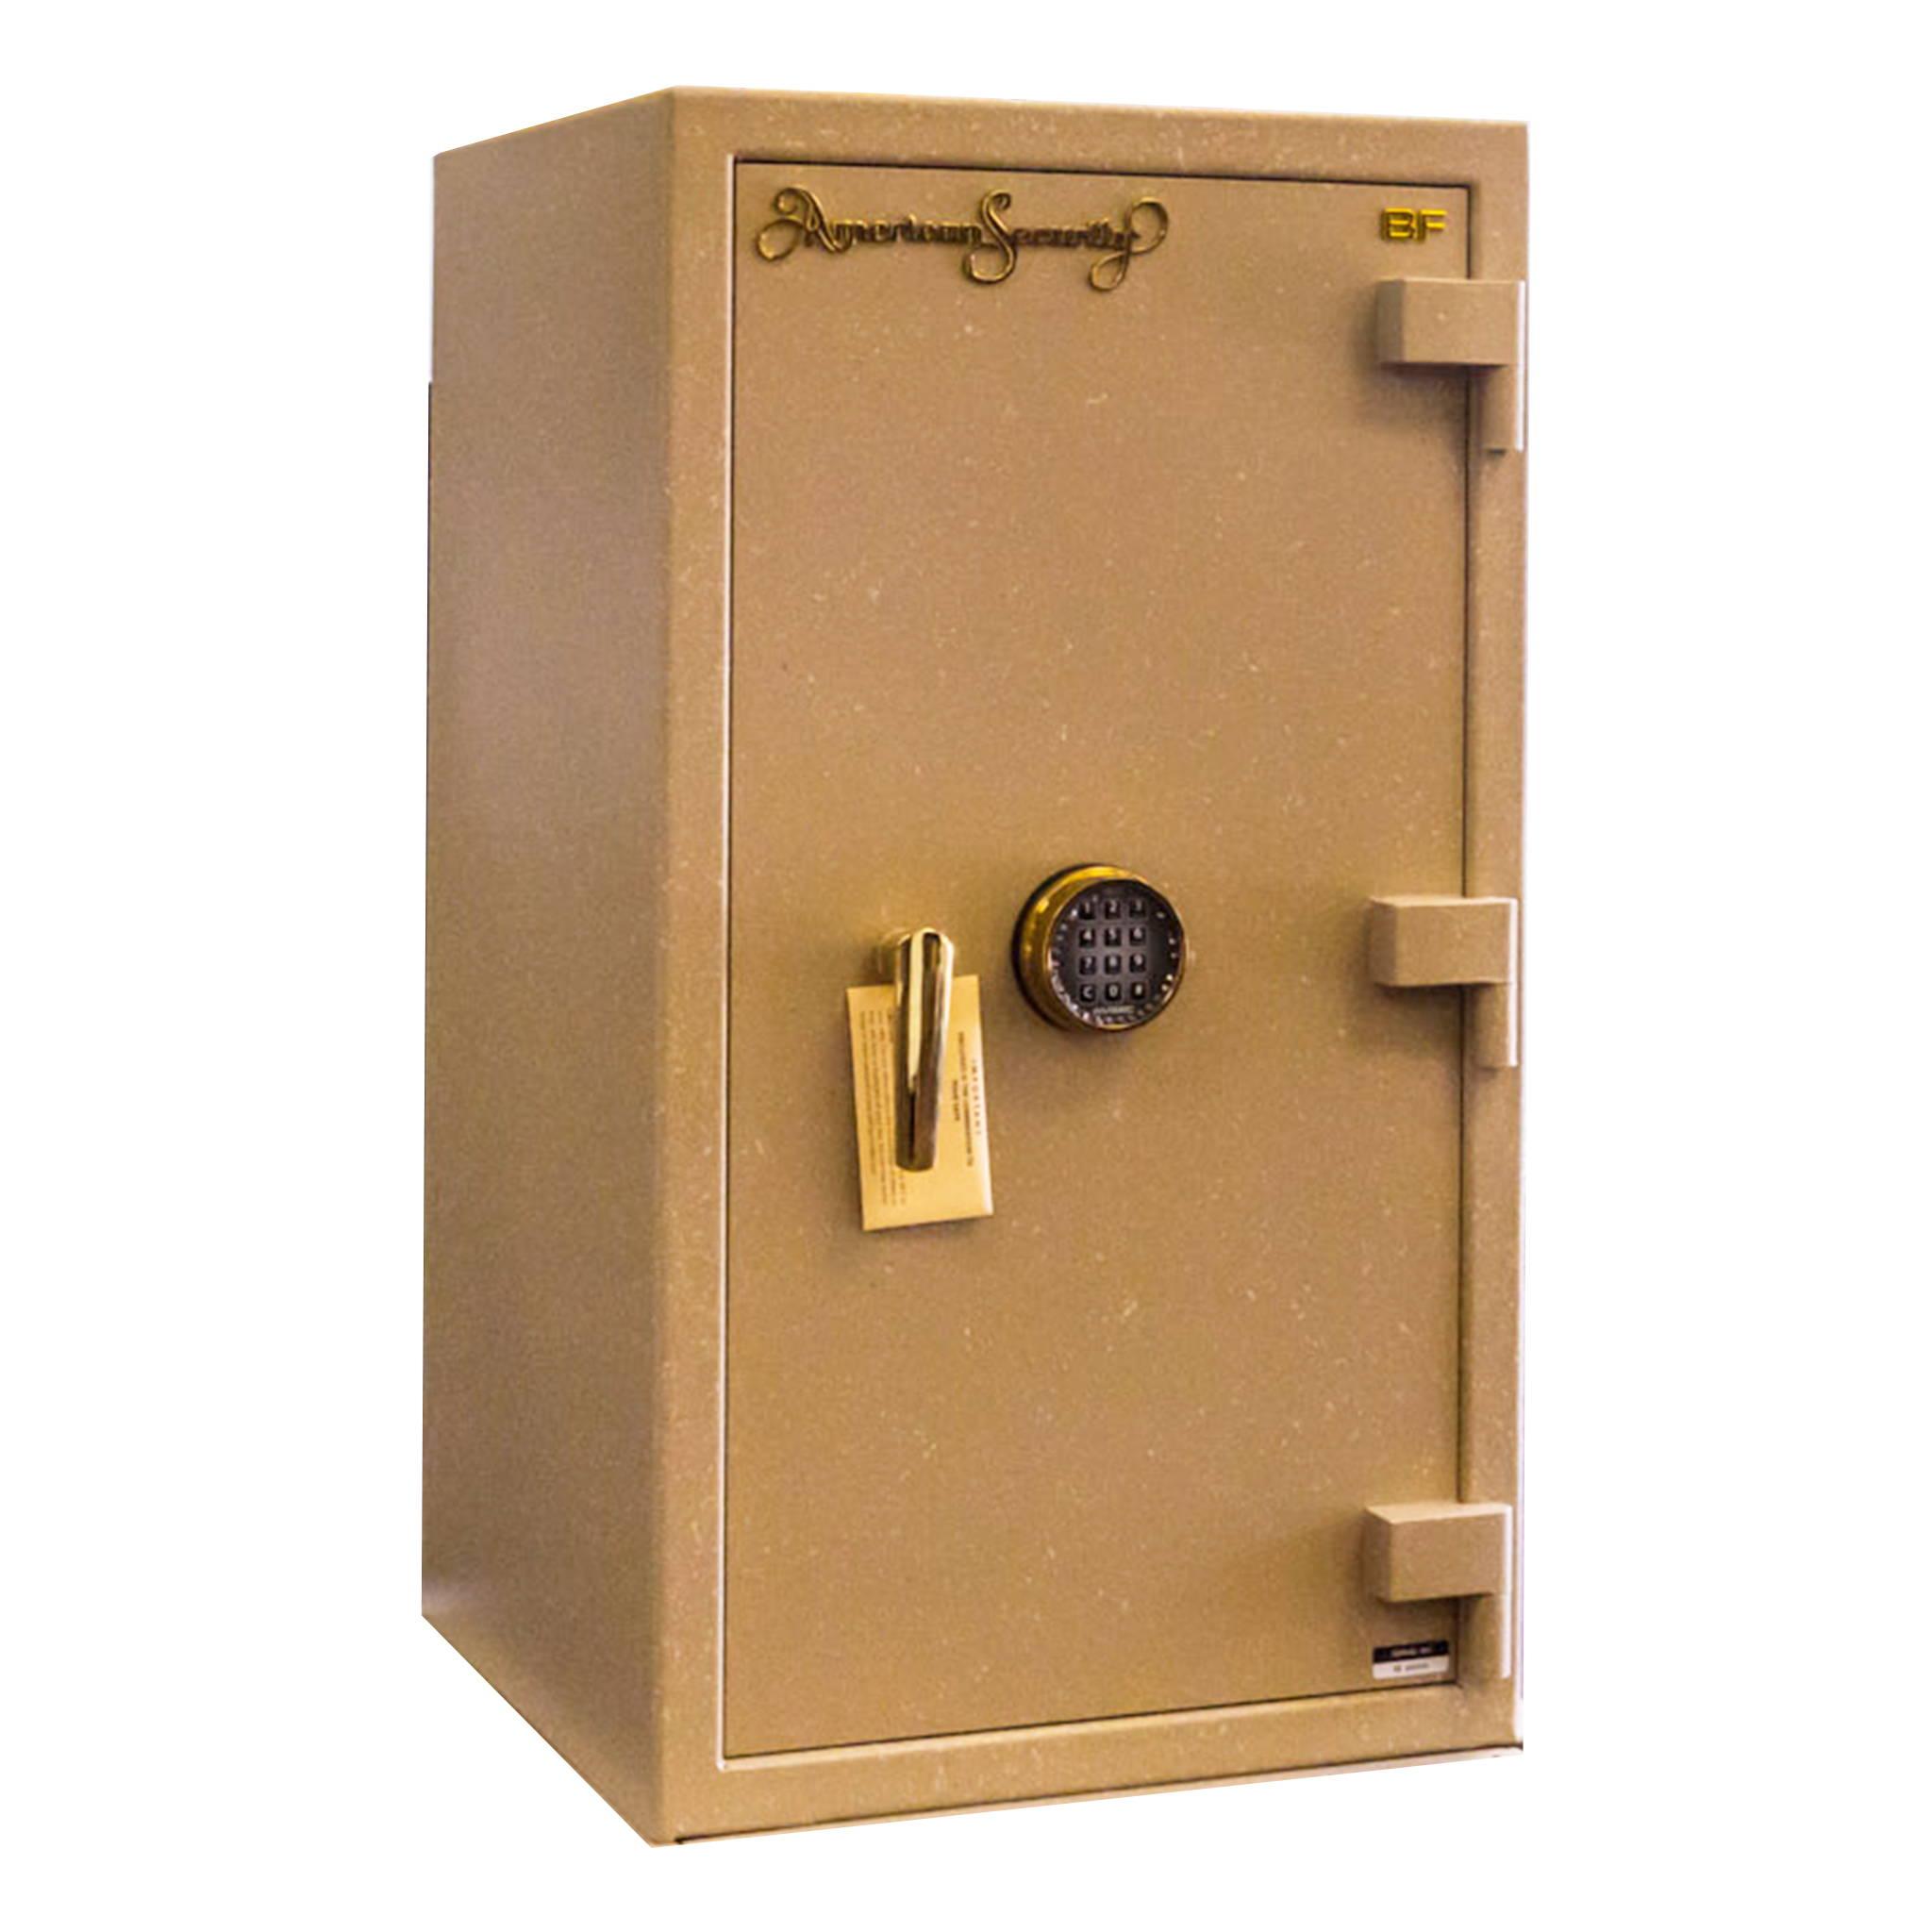 BF series jewelry safe